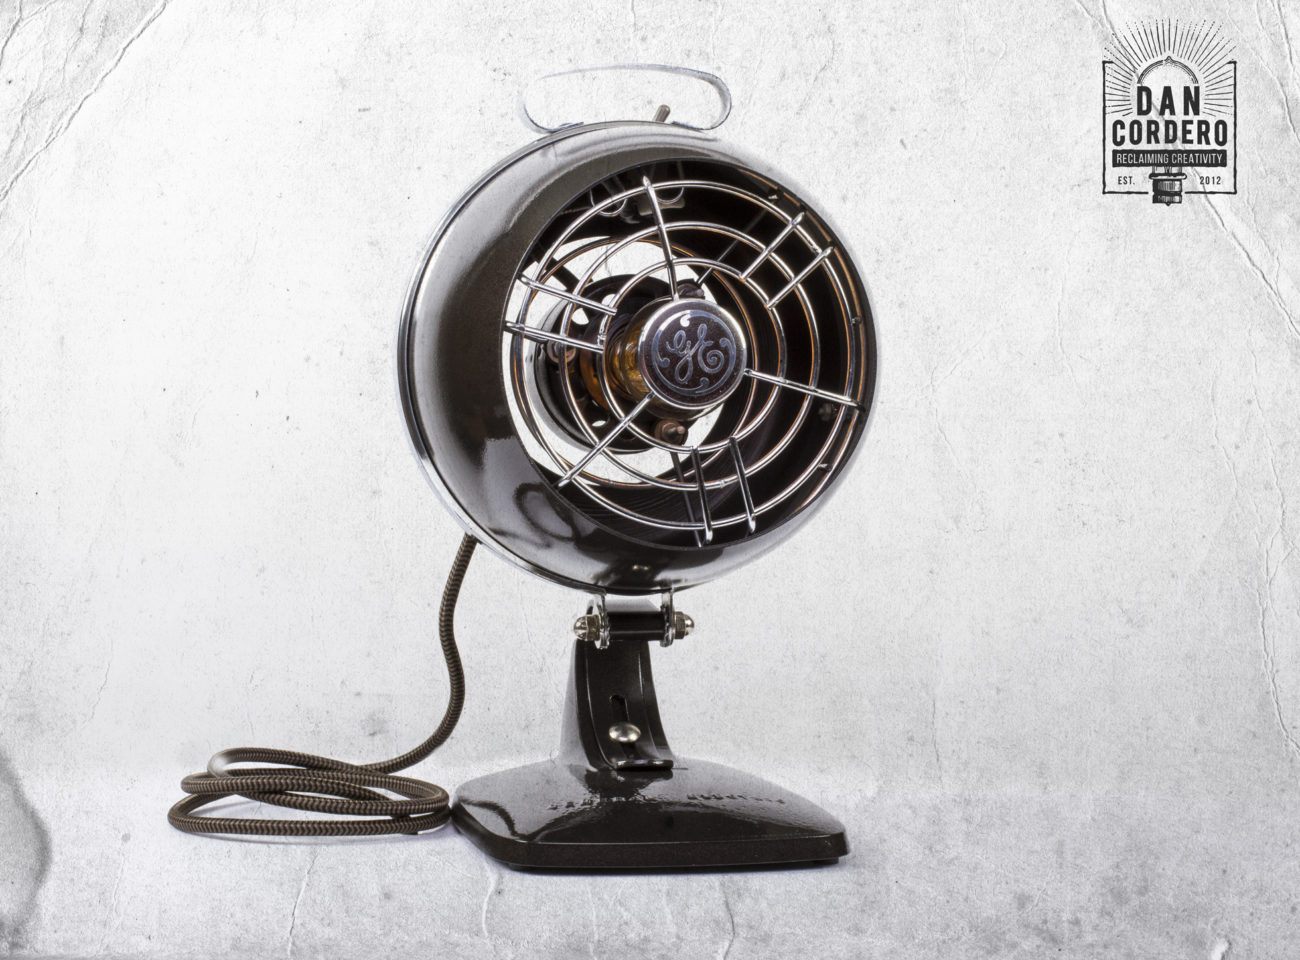 Heater Lamp